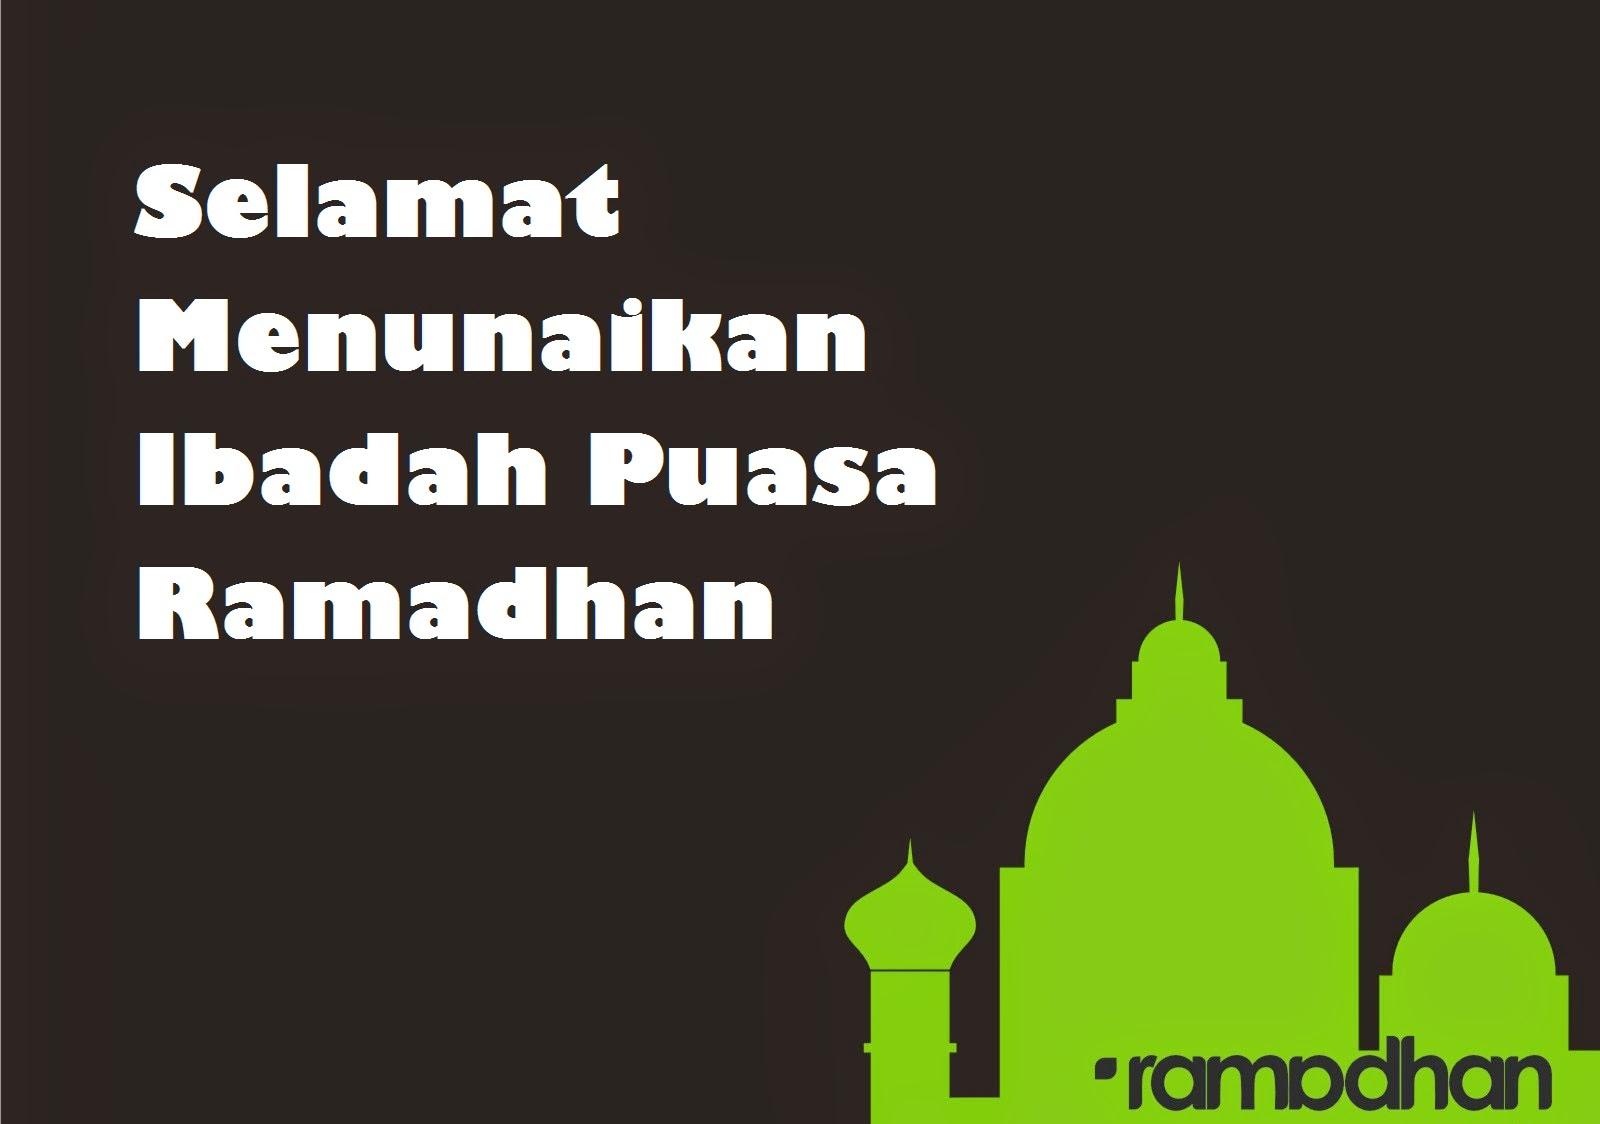 30 kata kata maaf menjelang ramadhan ideas kata mutiara terbaru